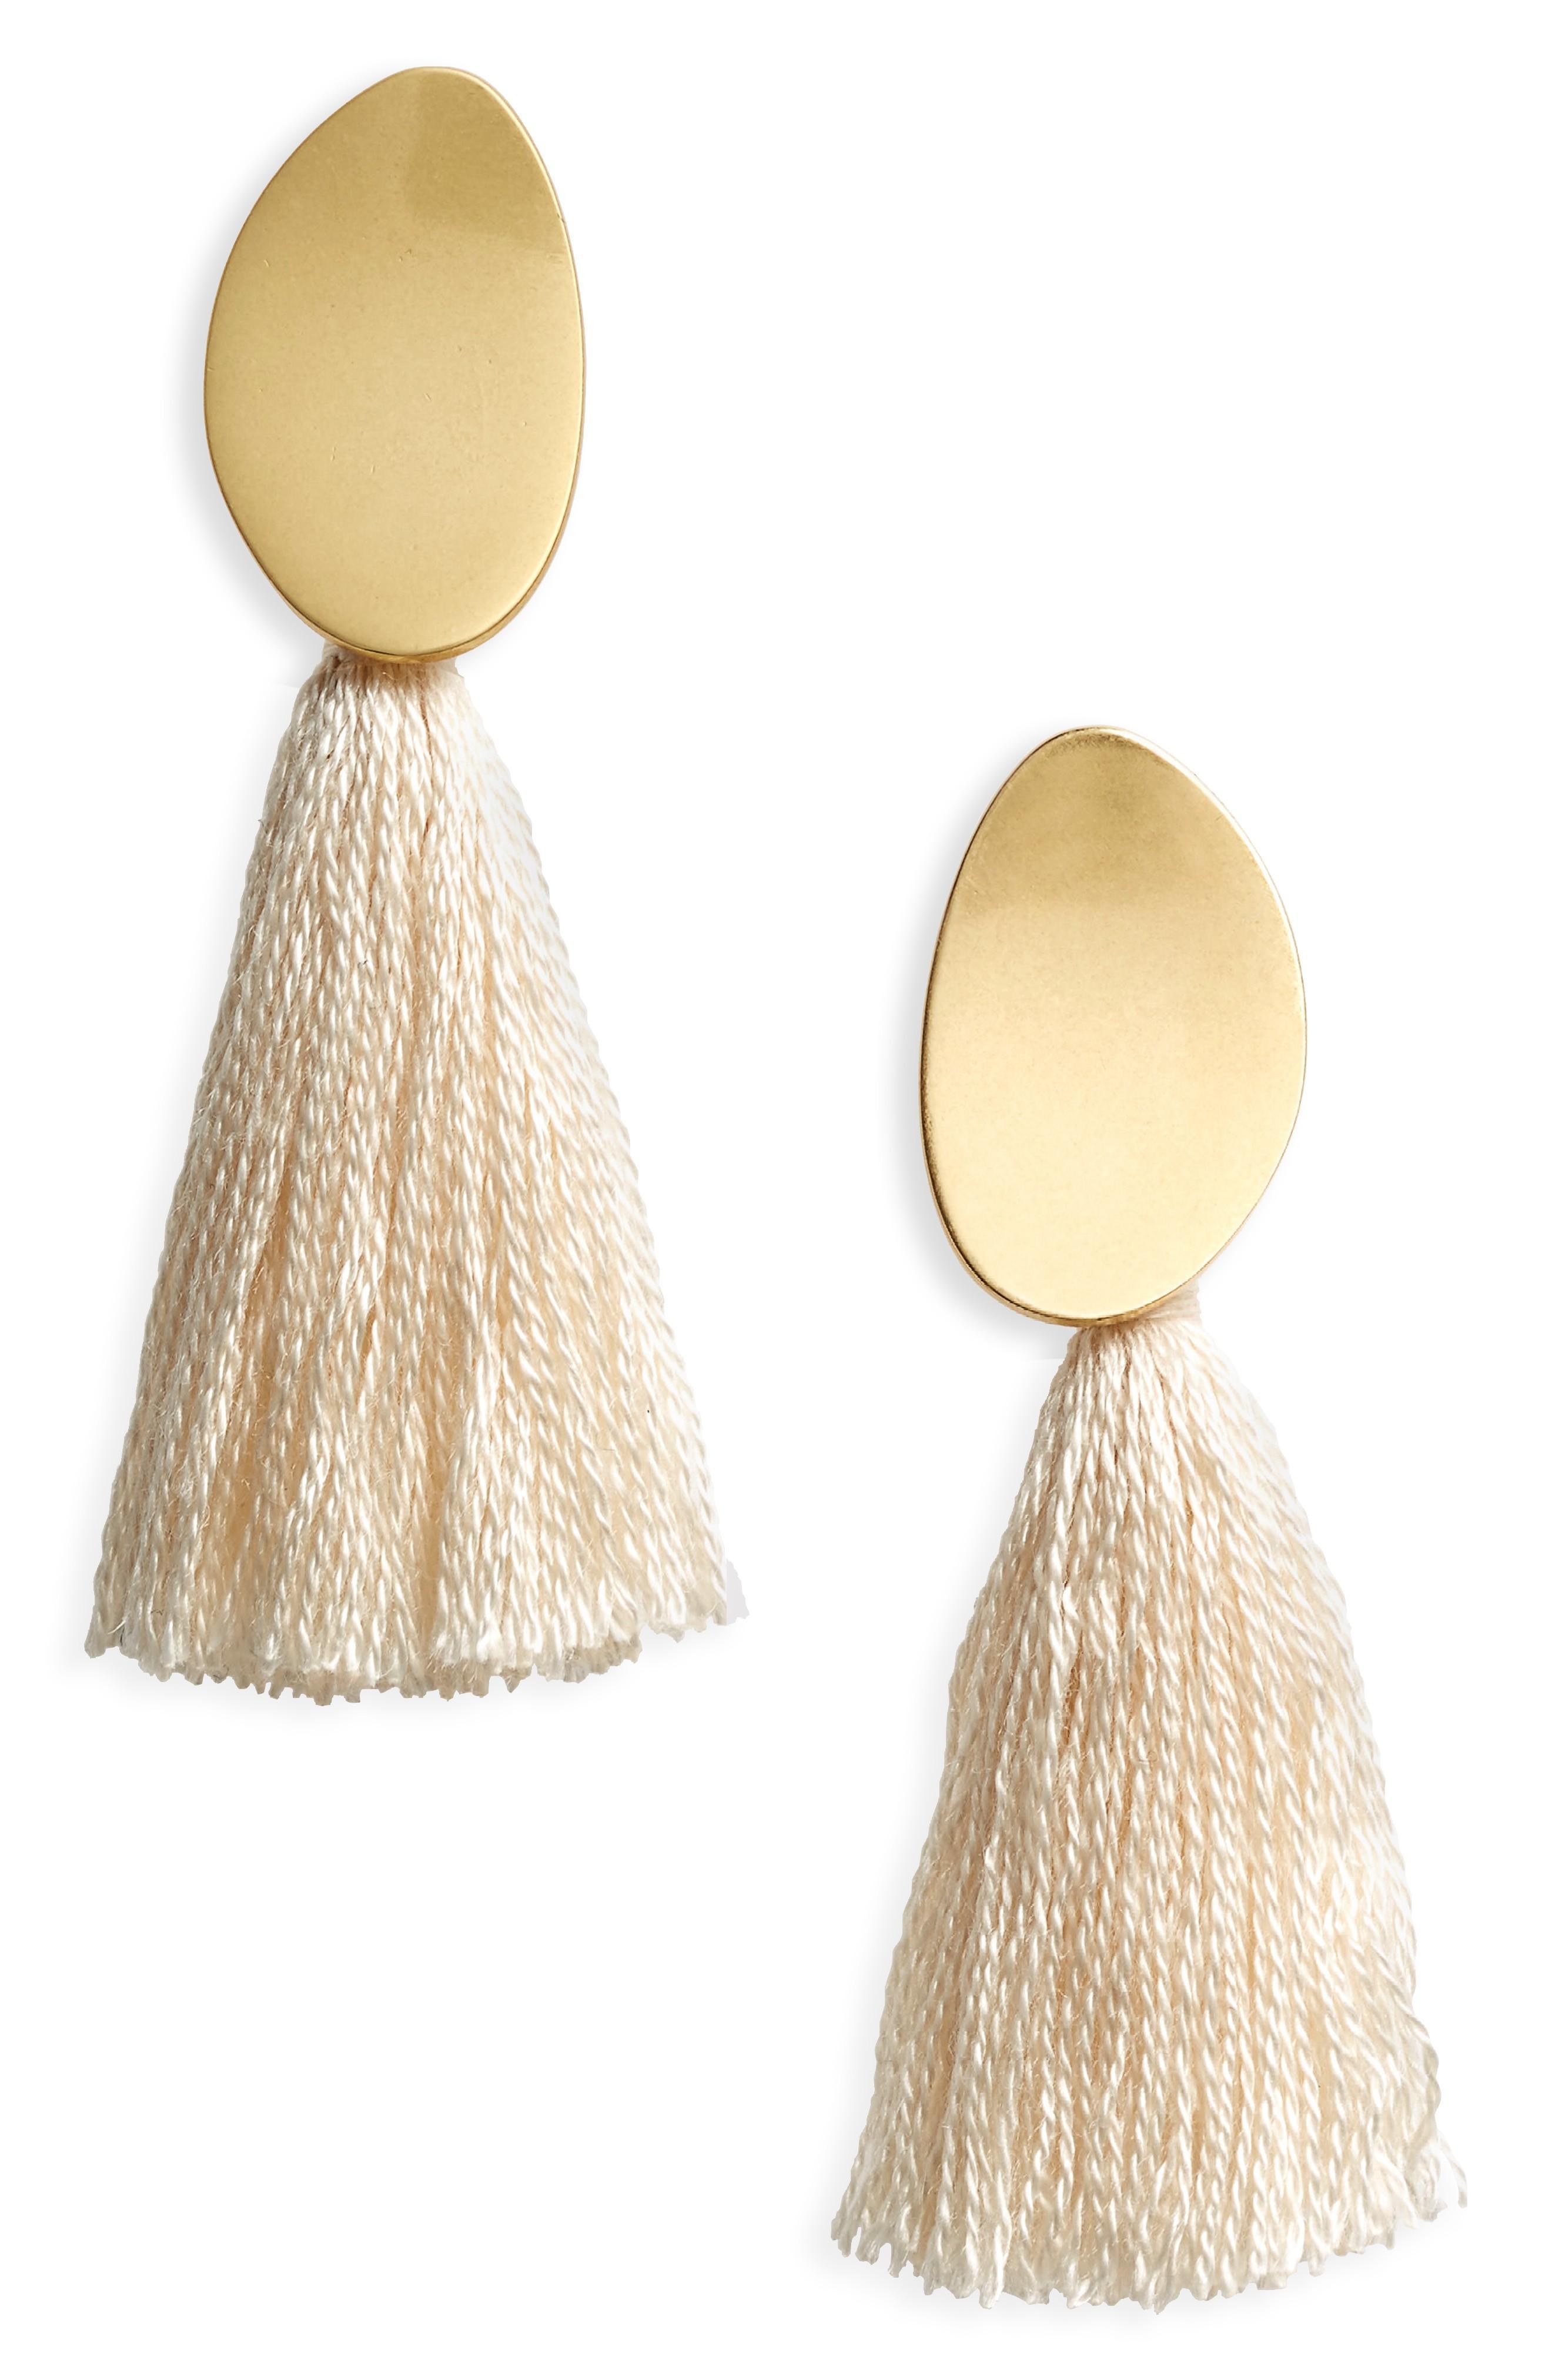 Madewell Curved Tassel Earrings In Cloud Lining